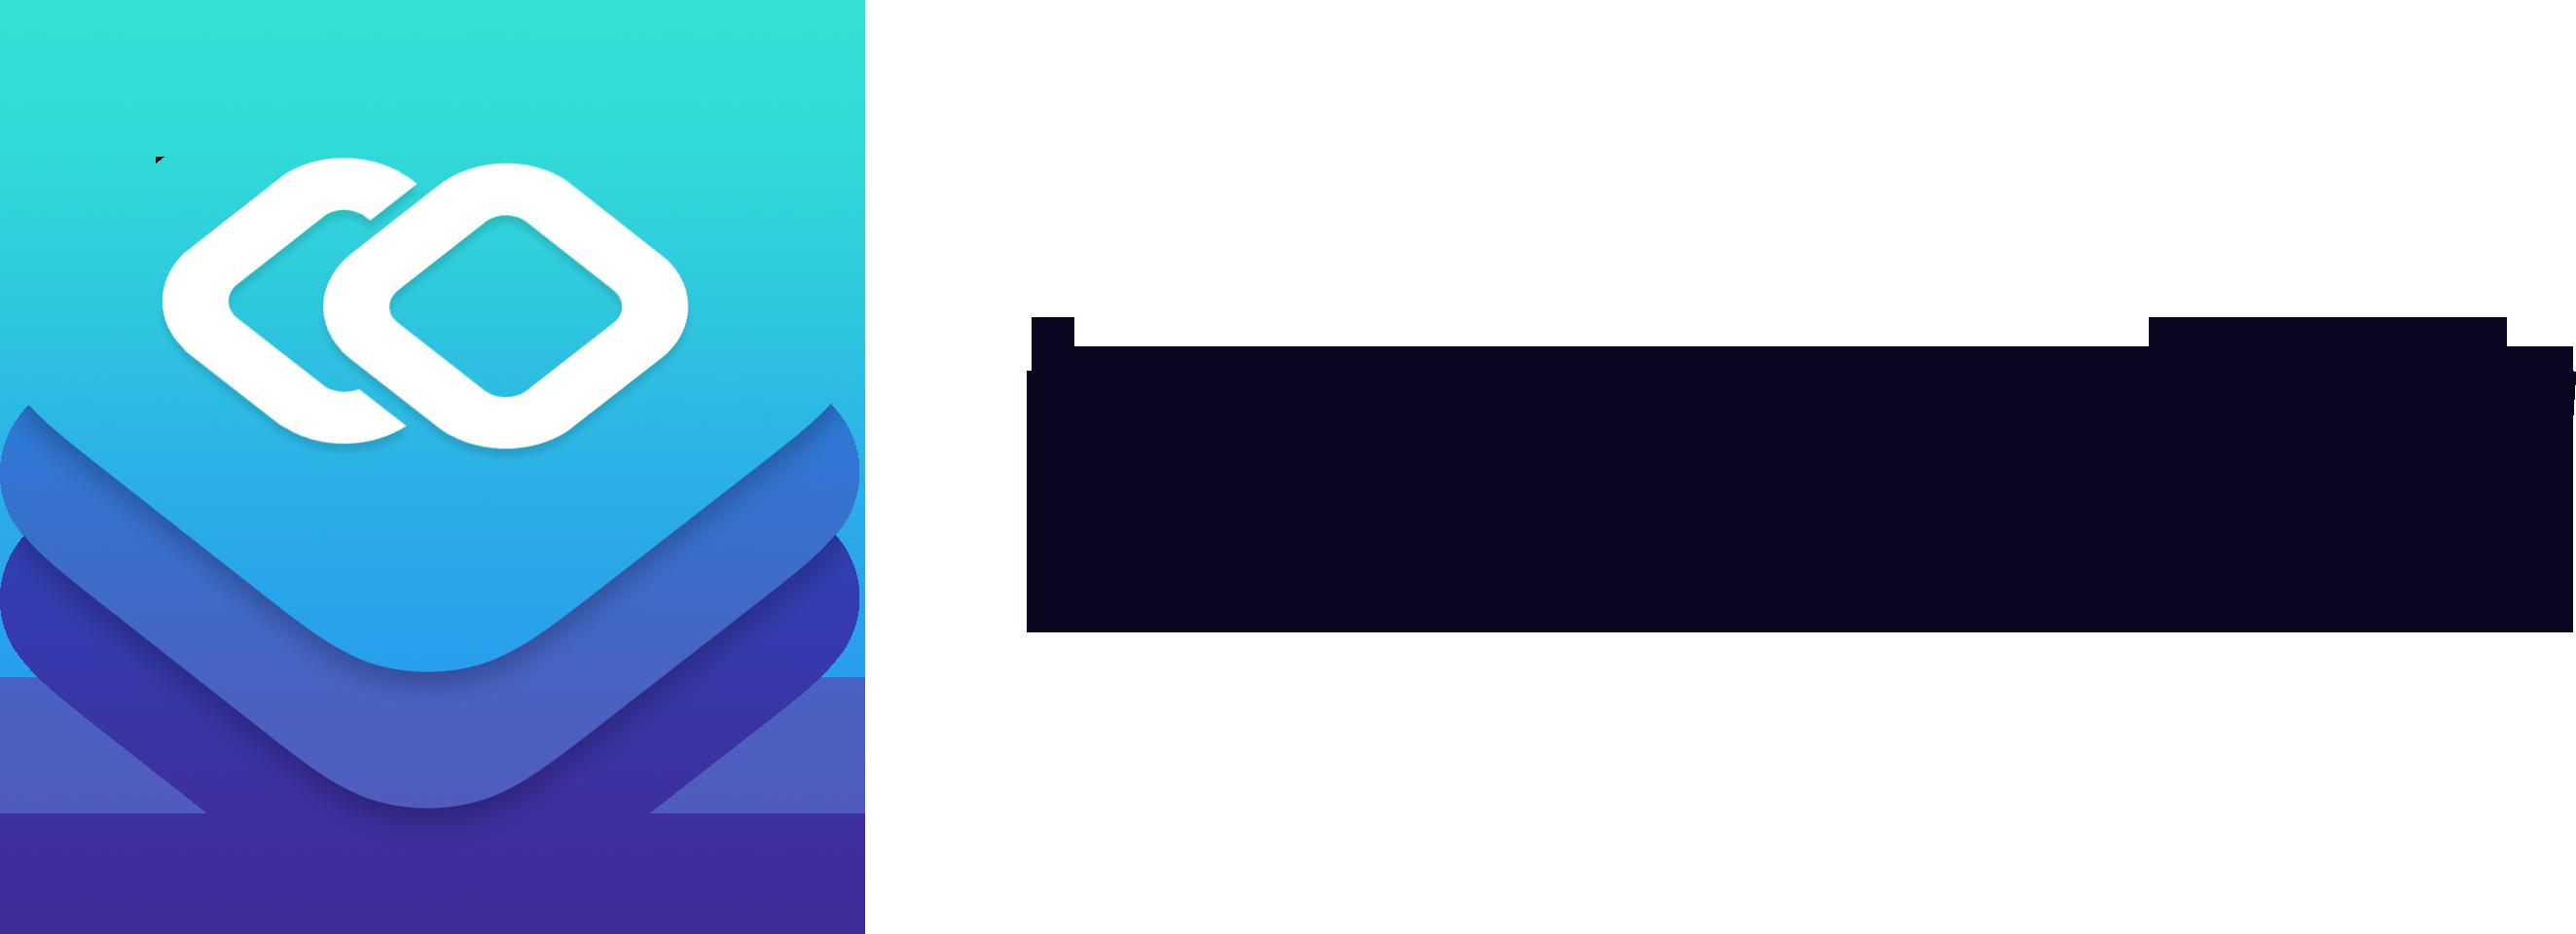 GitHub - IcaliaLabs/Presentr: Swift wrapper for custom